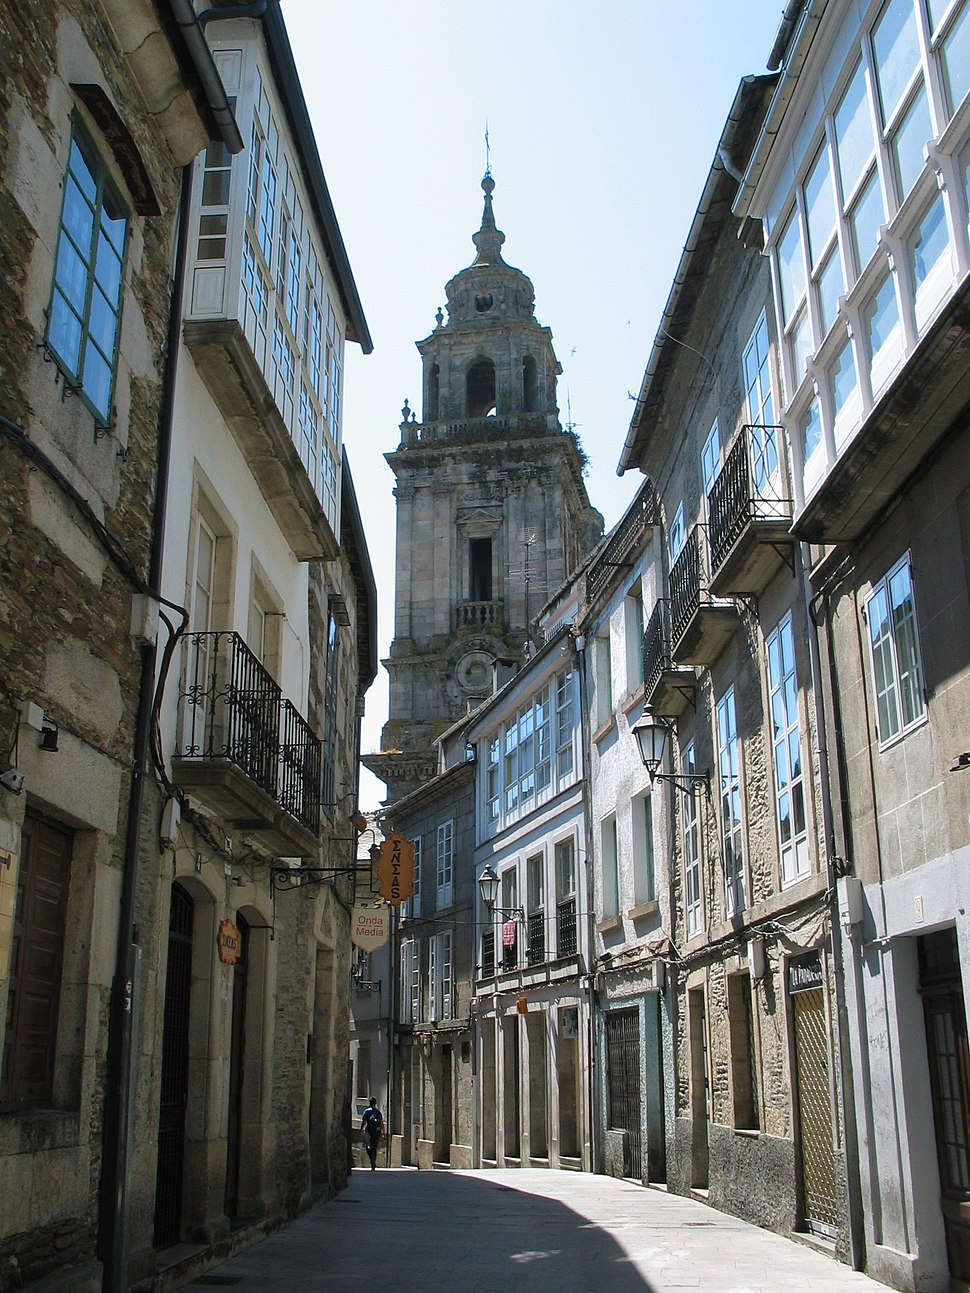 Lugo casco viejo